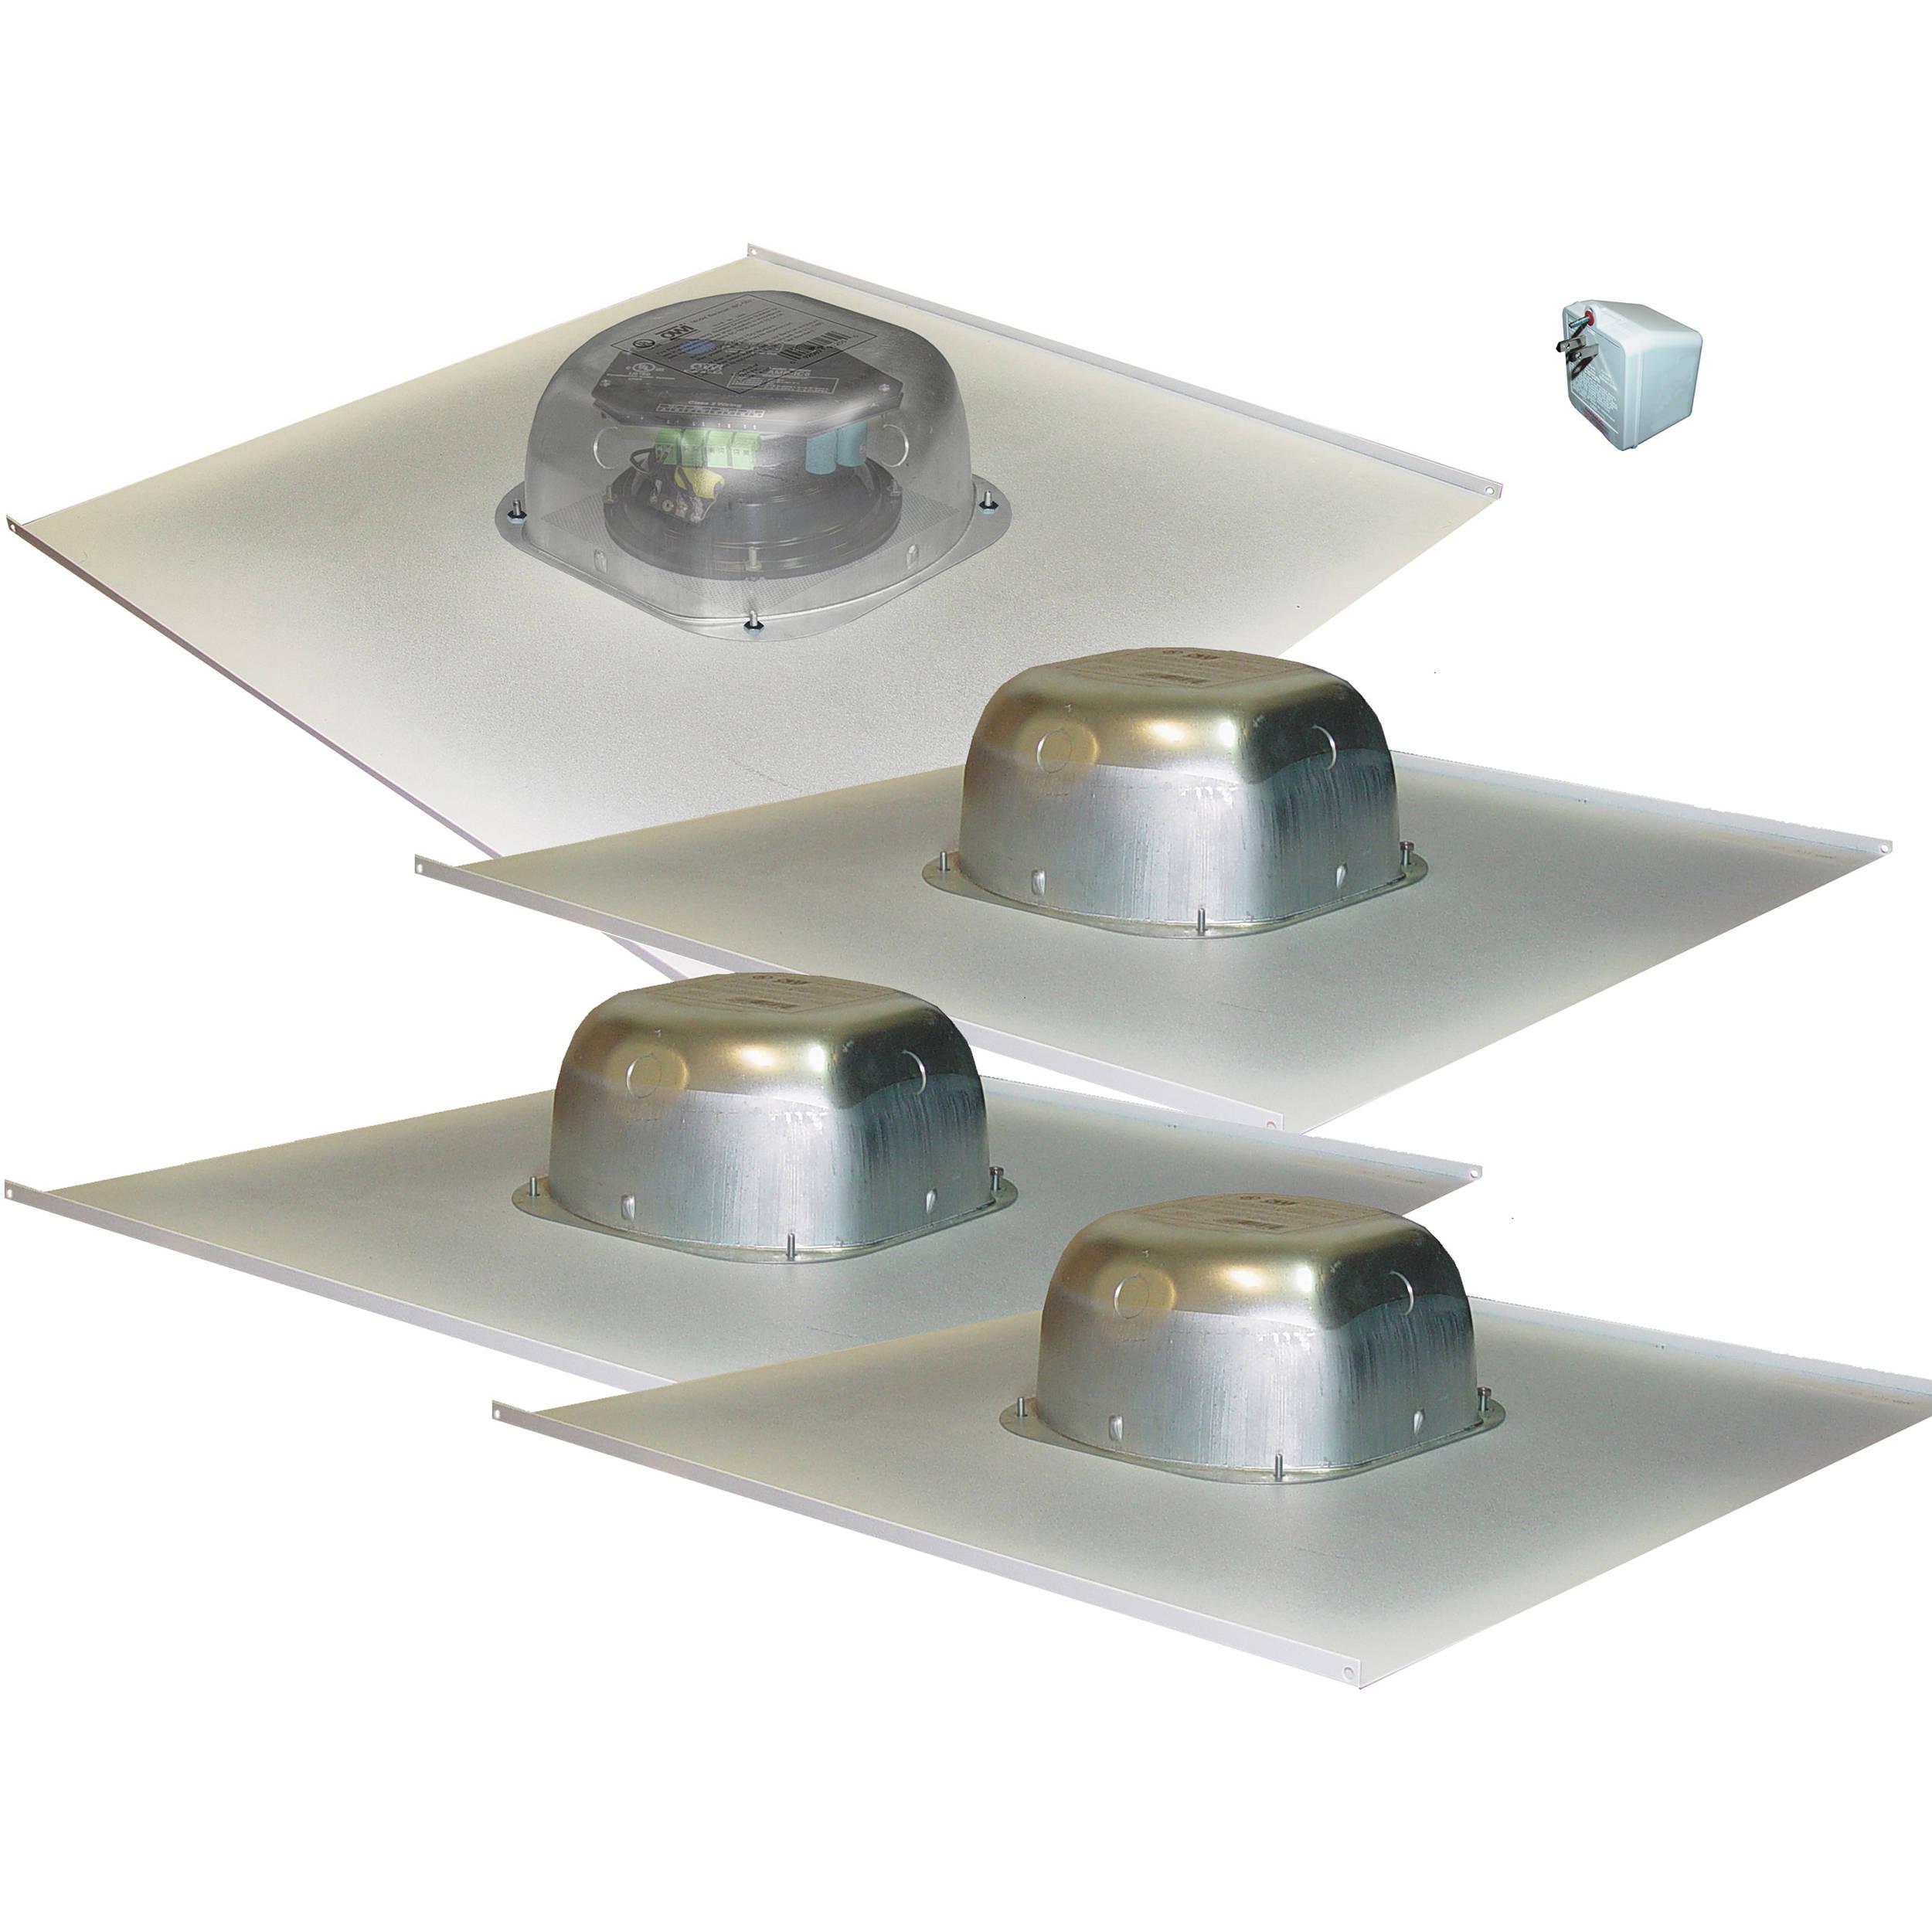 2x2 Drop In Ceiling Lights : Owi inc amplified drop ceiling speaker on a